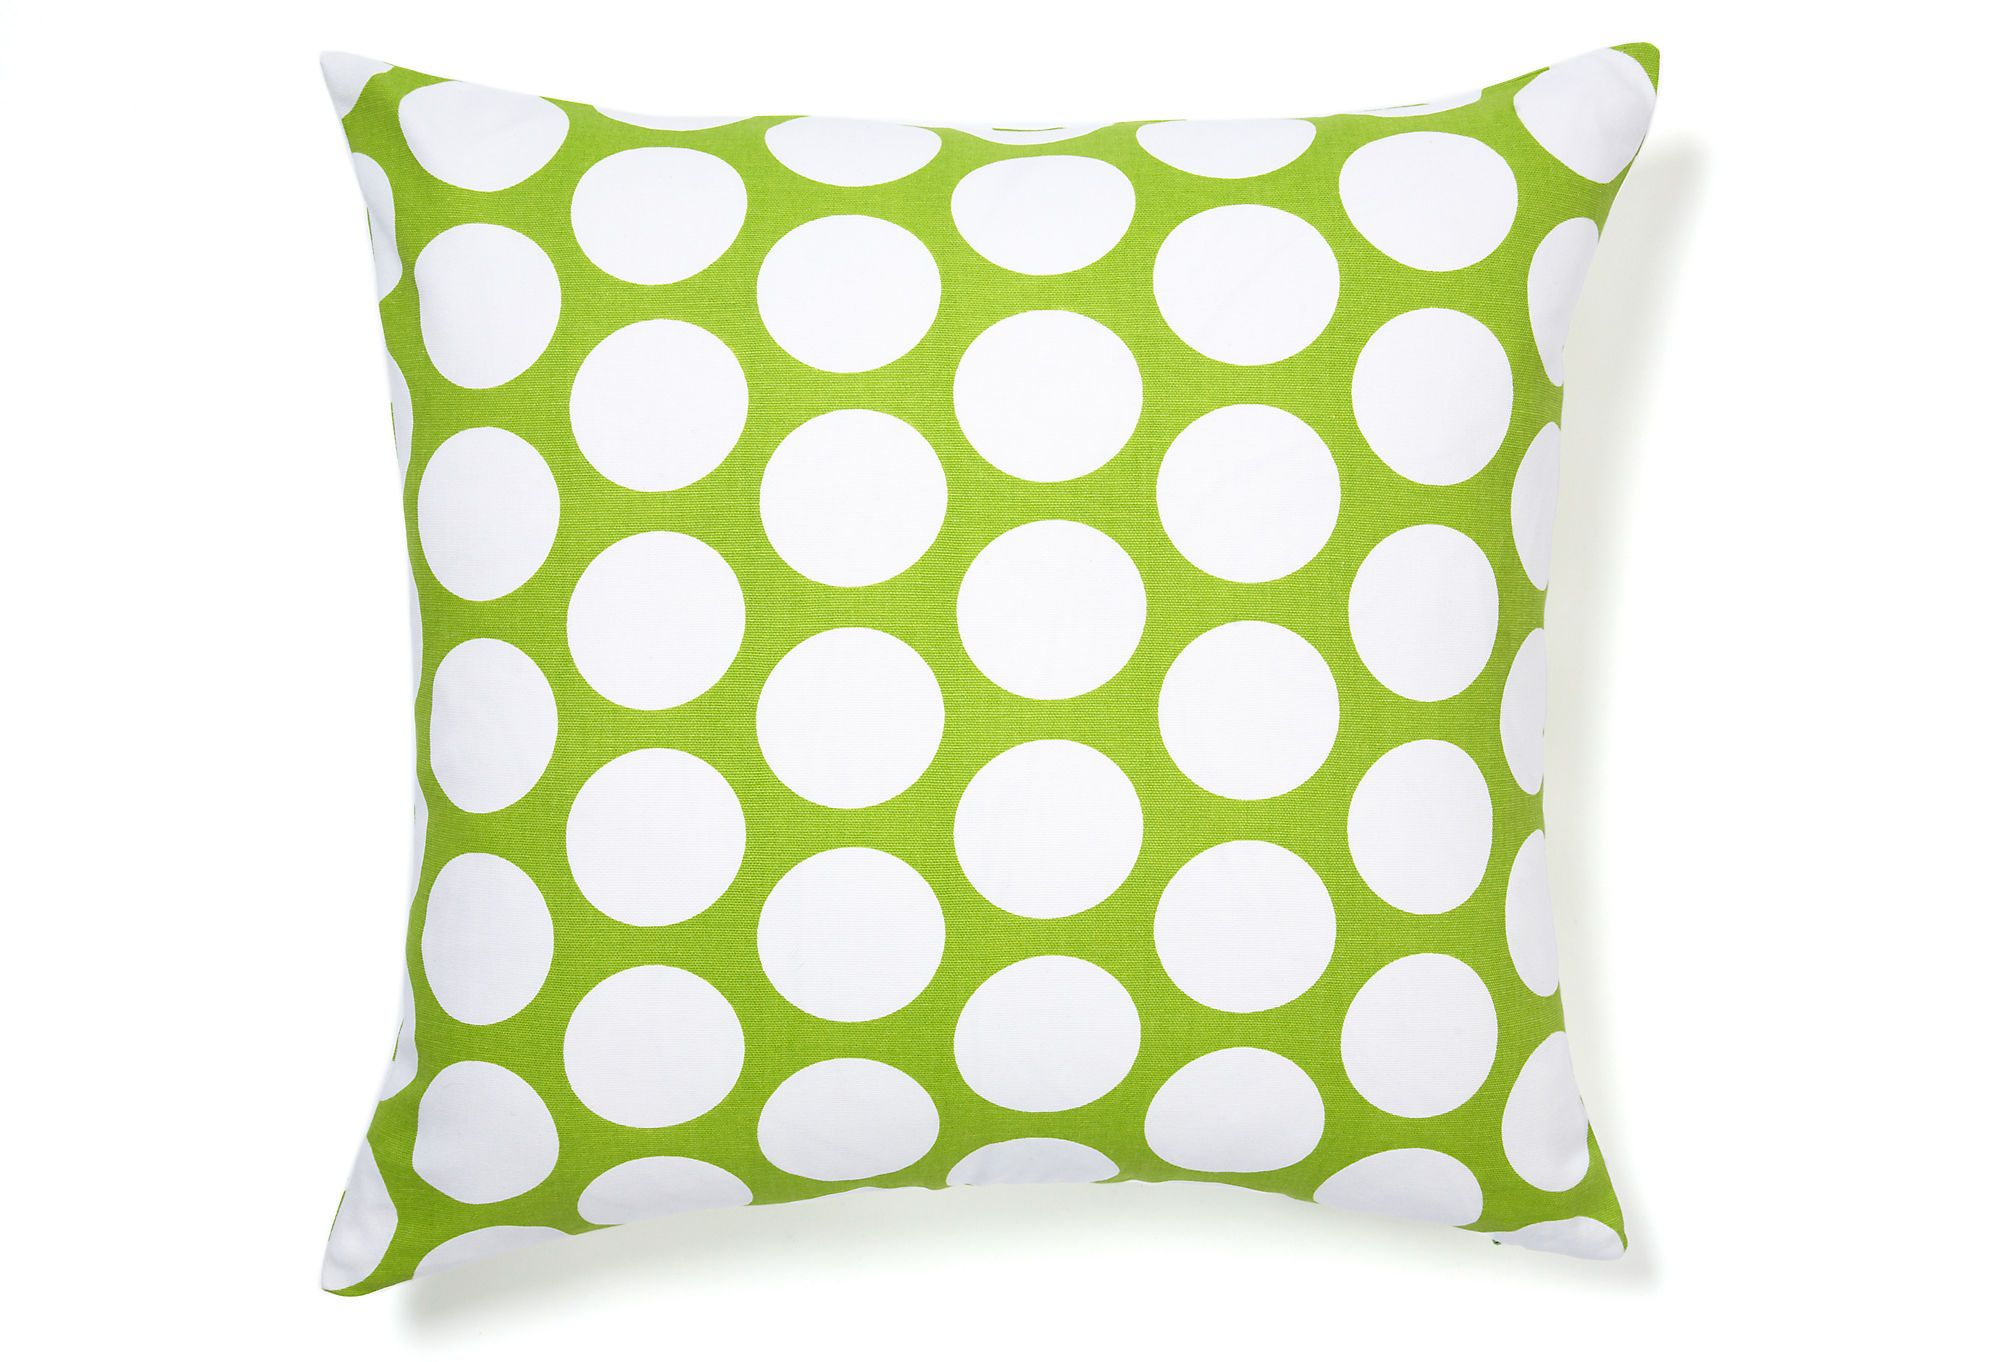 Spotlight On Polka Dots Polka Pillow Lime Jiti 39 00 Green Pillow Covers Green Pillows Pillows